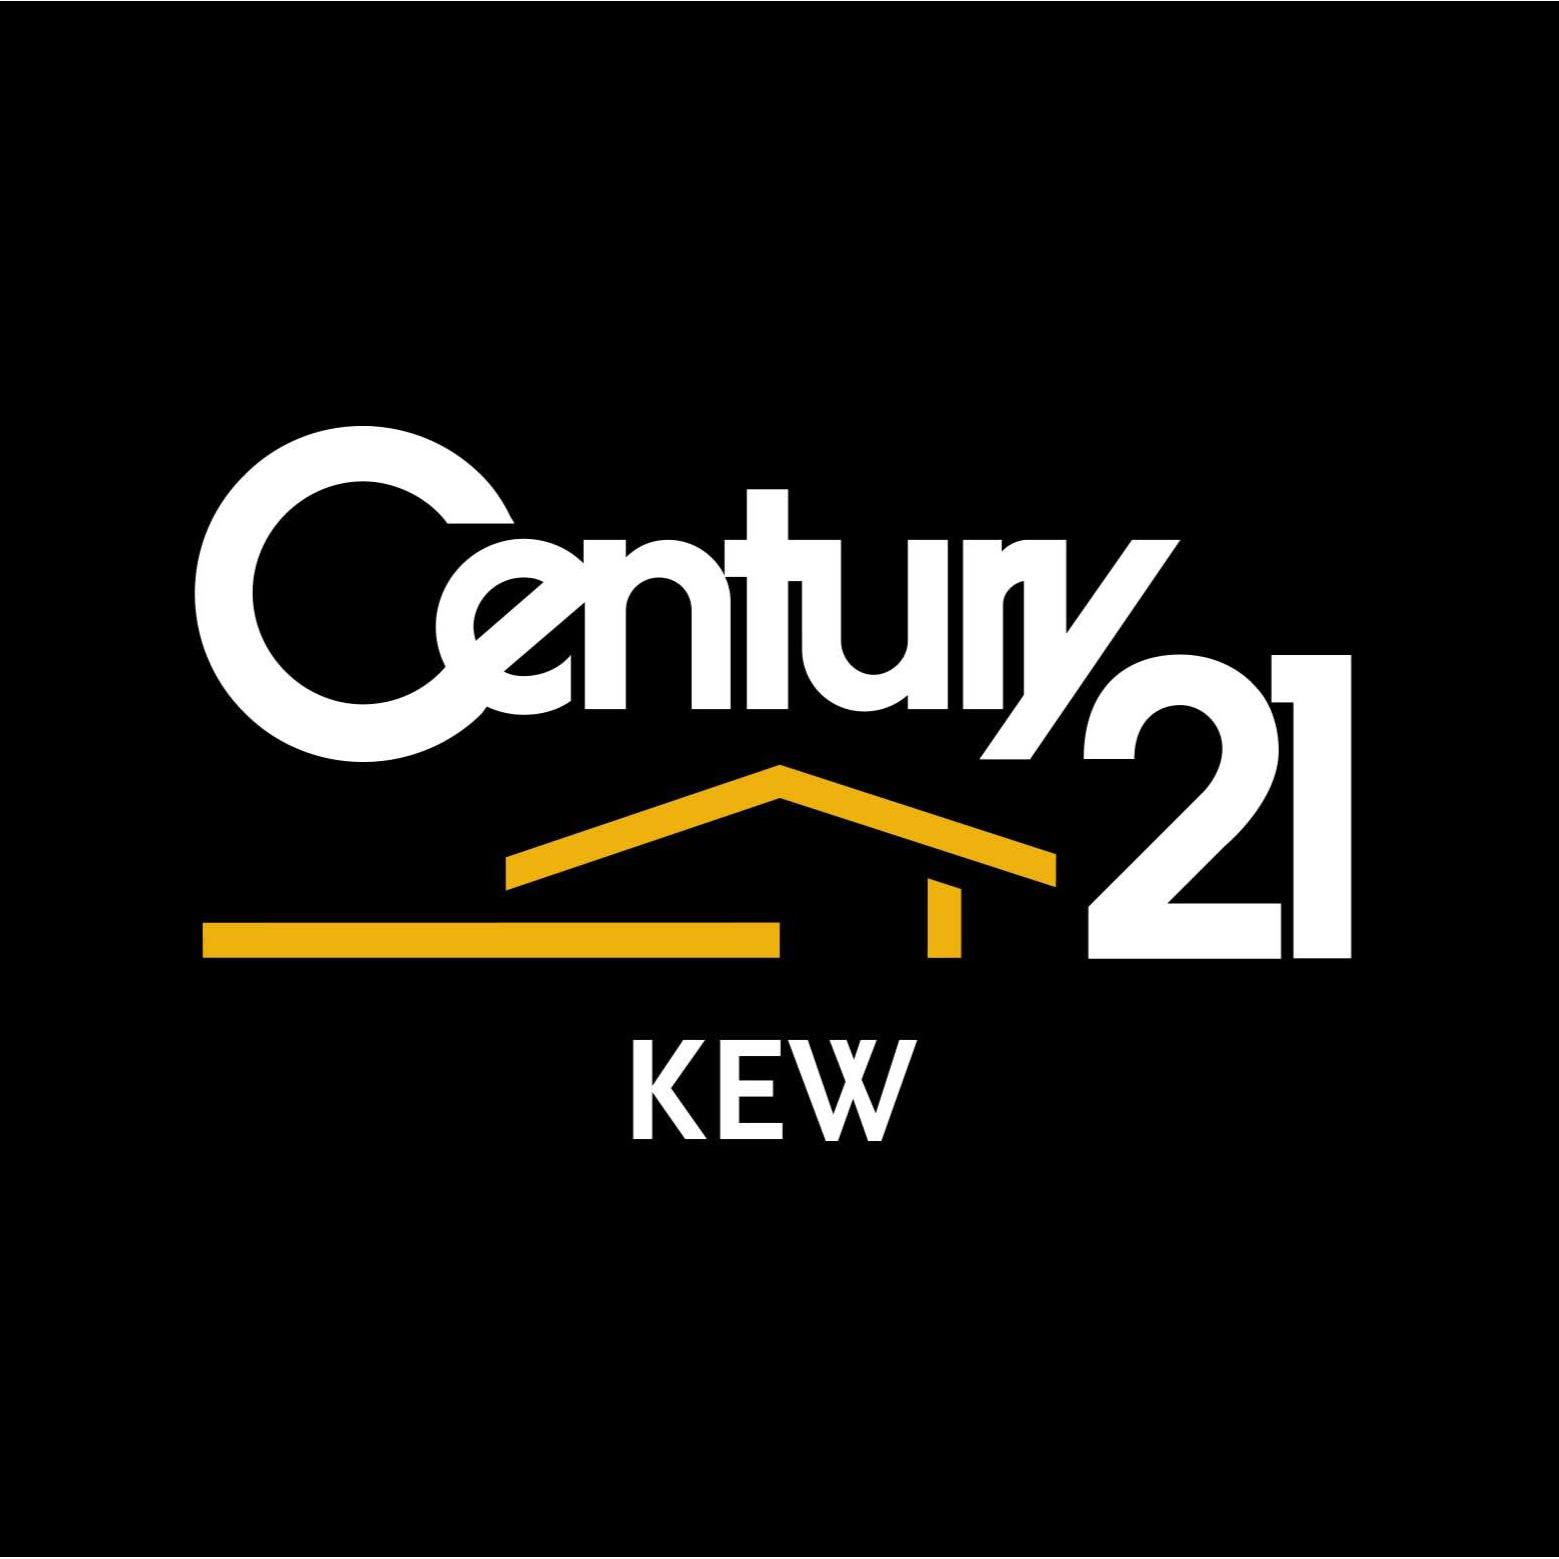 Century 21 Kew - London, London W4 3AG - 020 8617 9099 | ShowMeLocal.com